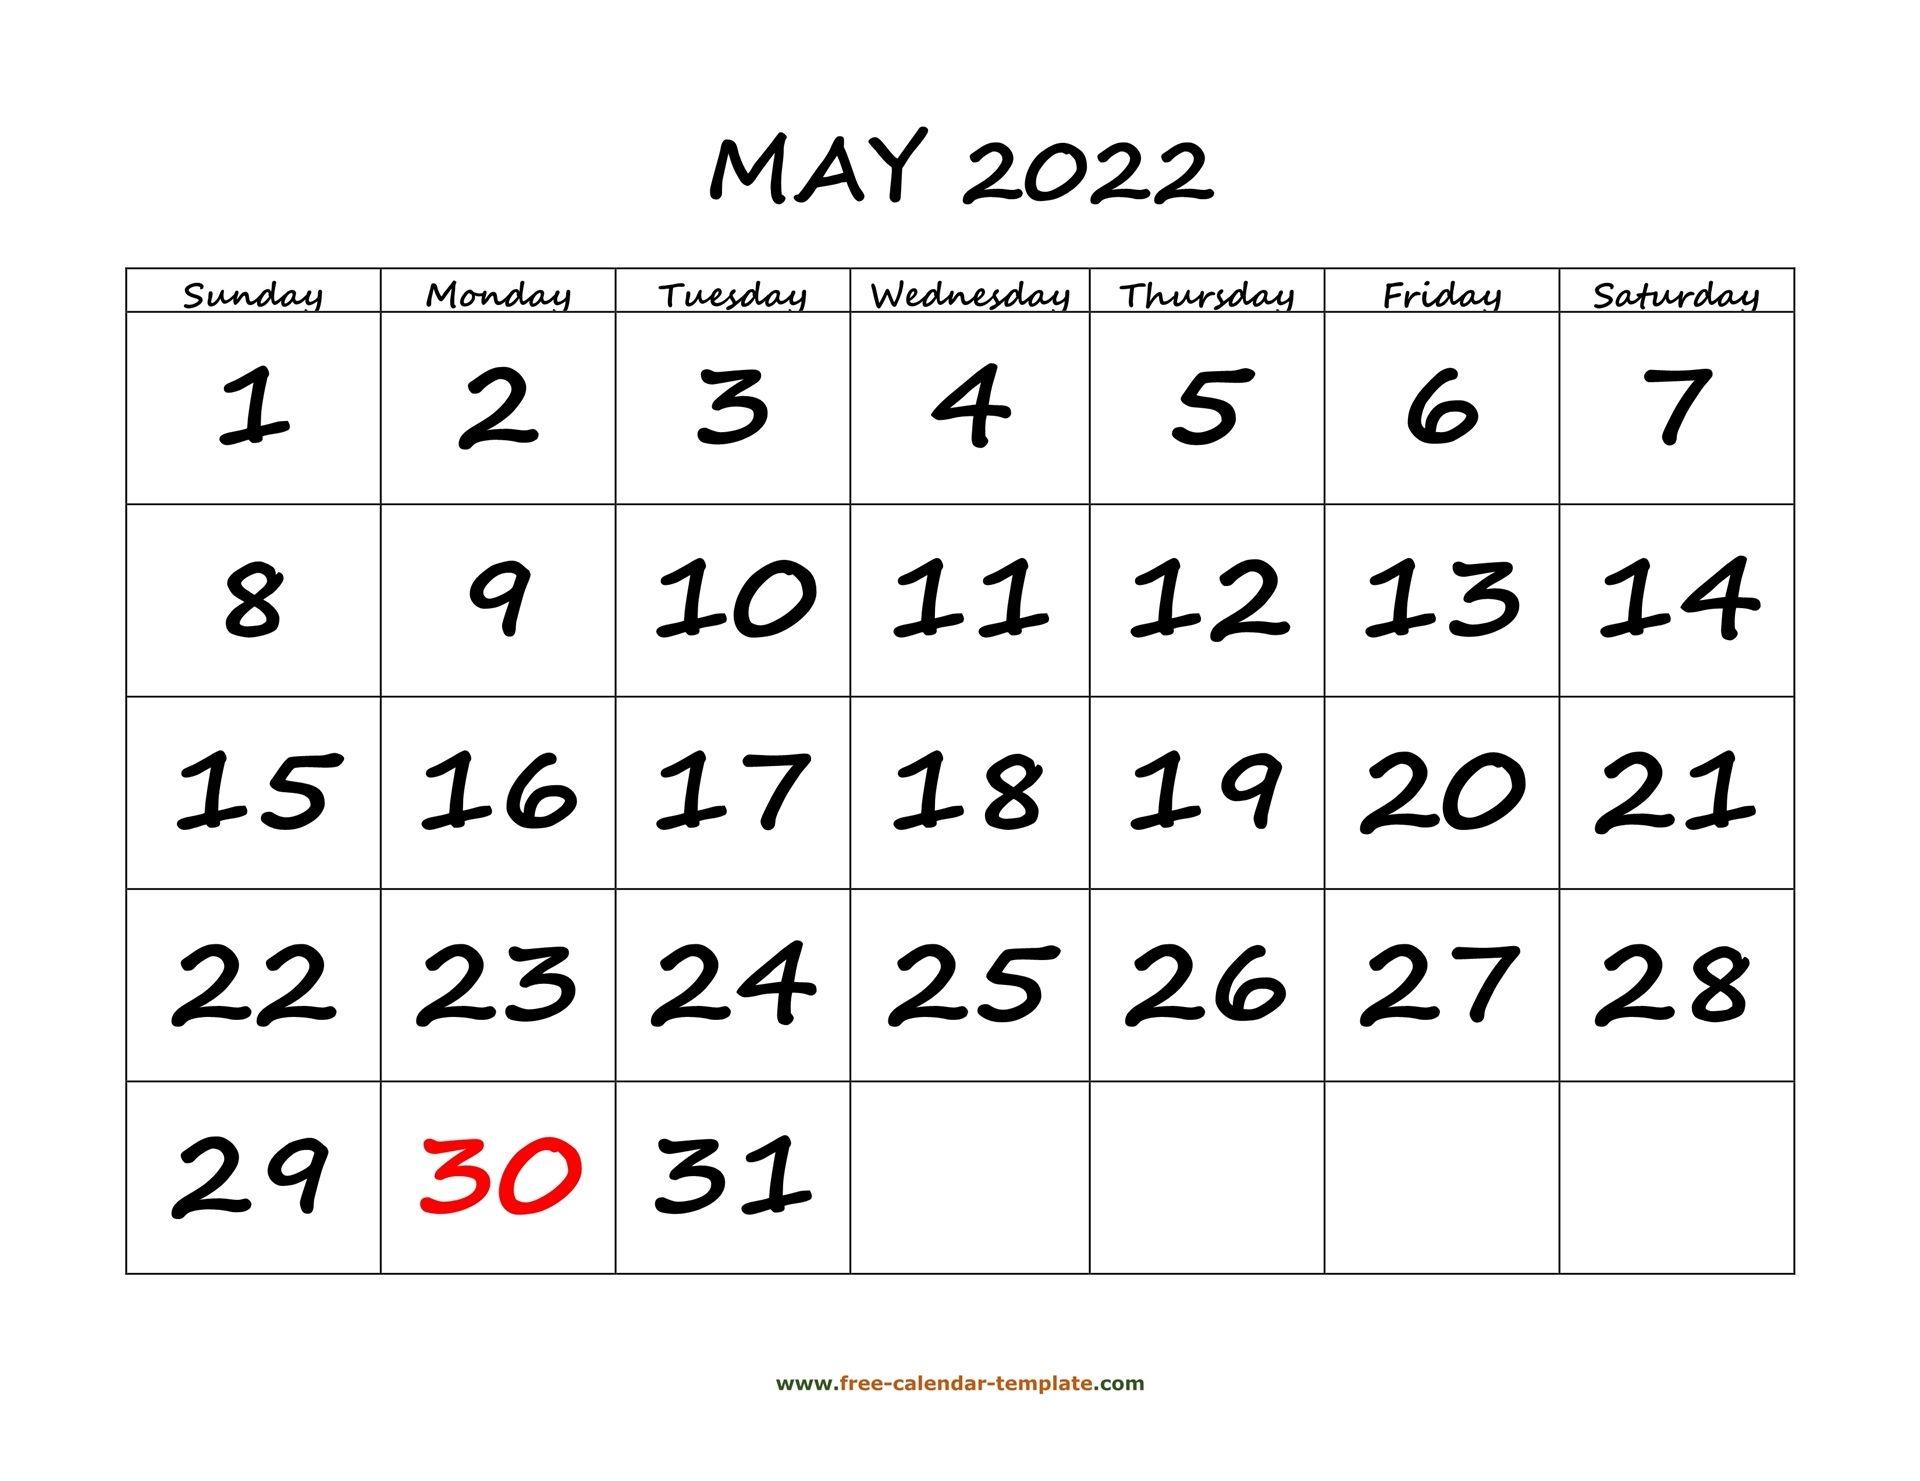 May 2022 Free Calendar Tempplate   Free-Calendar-Template